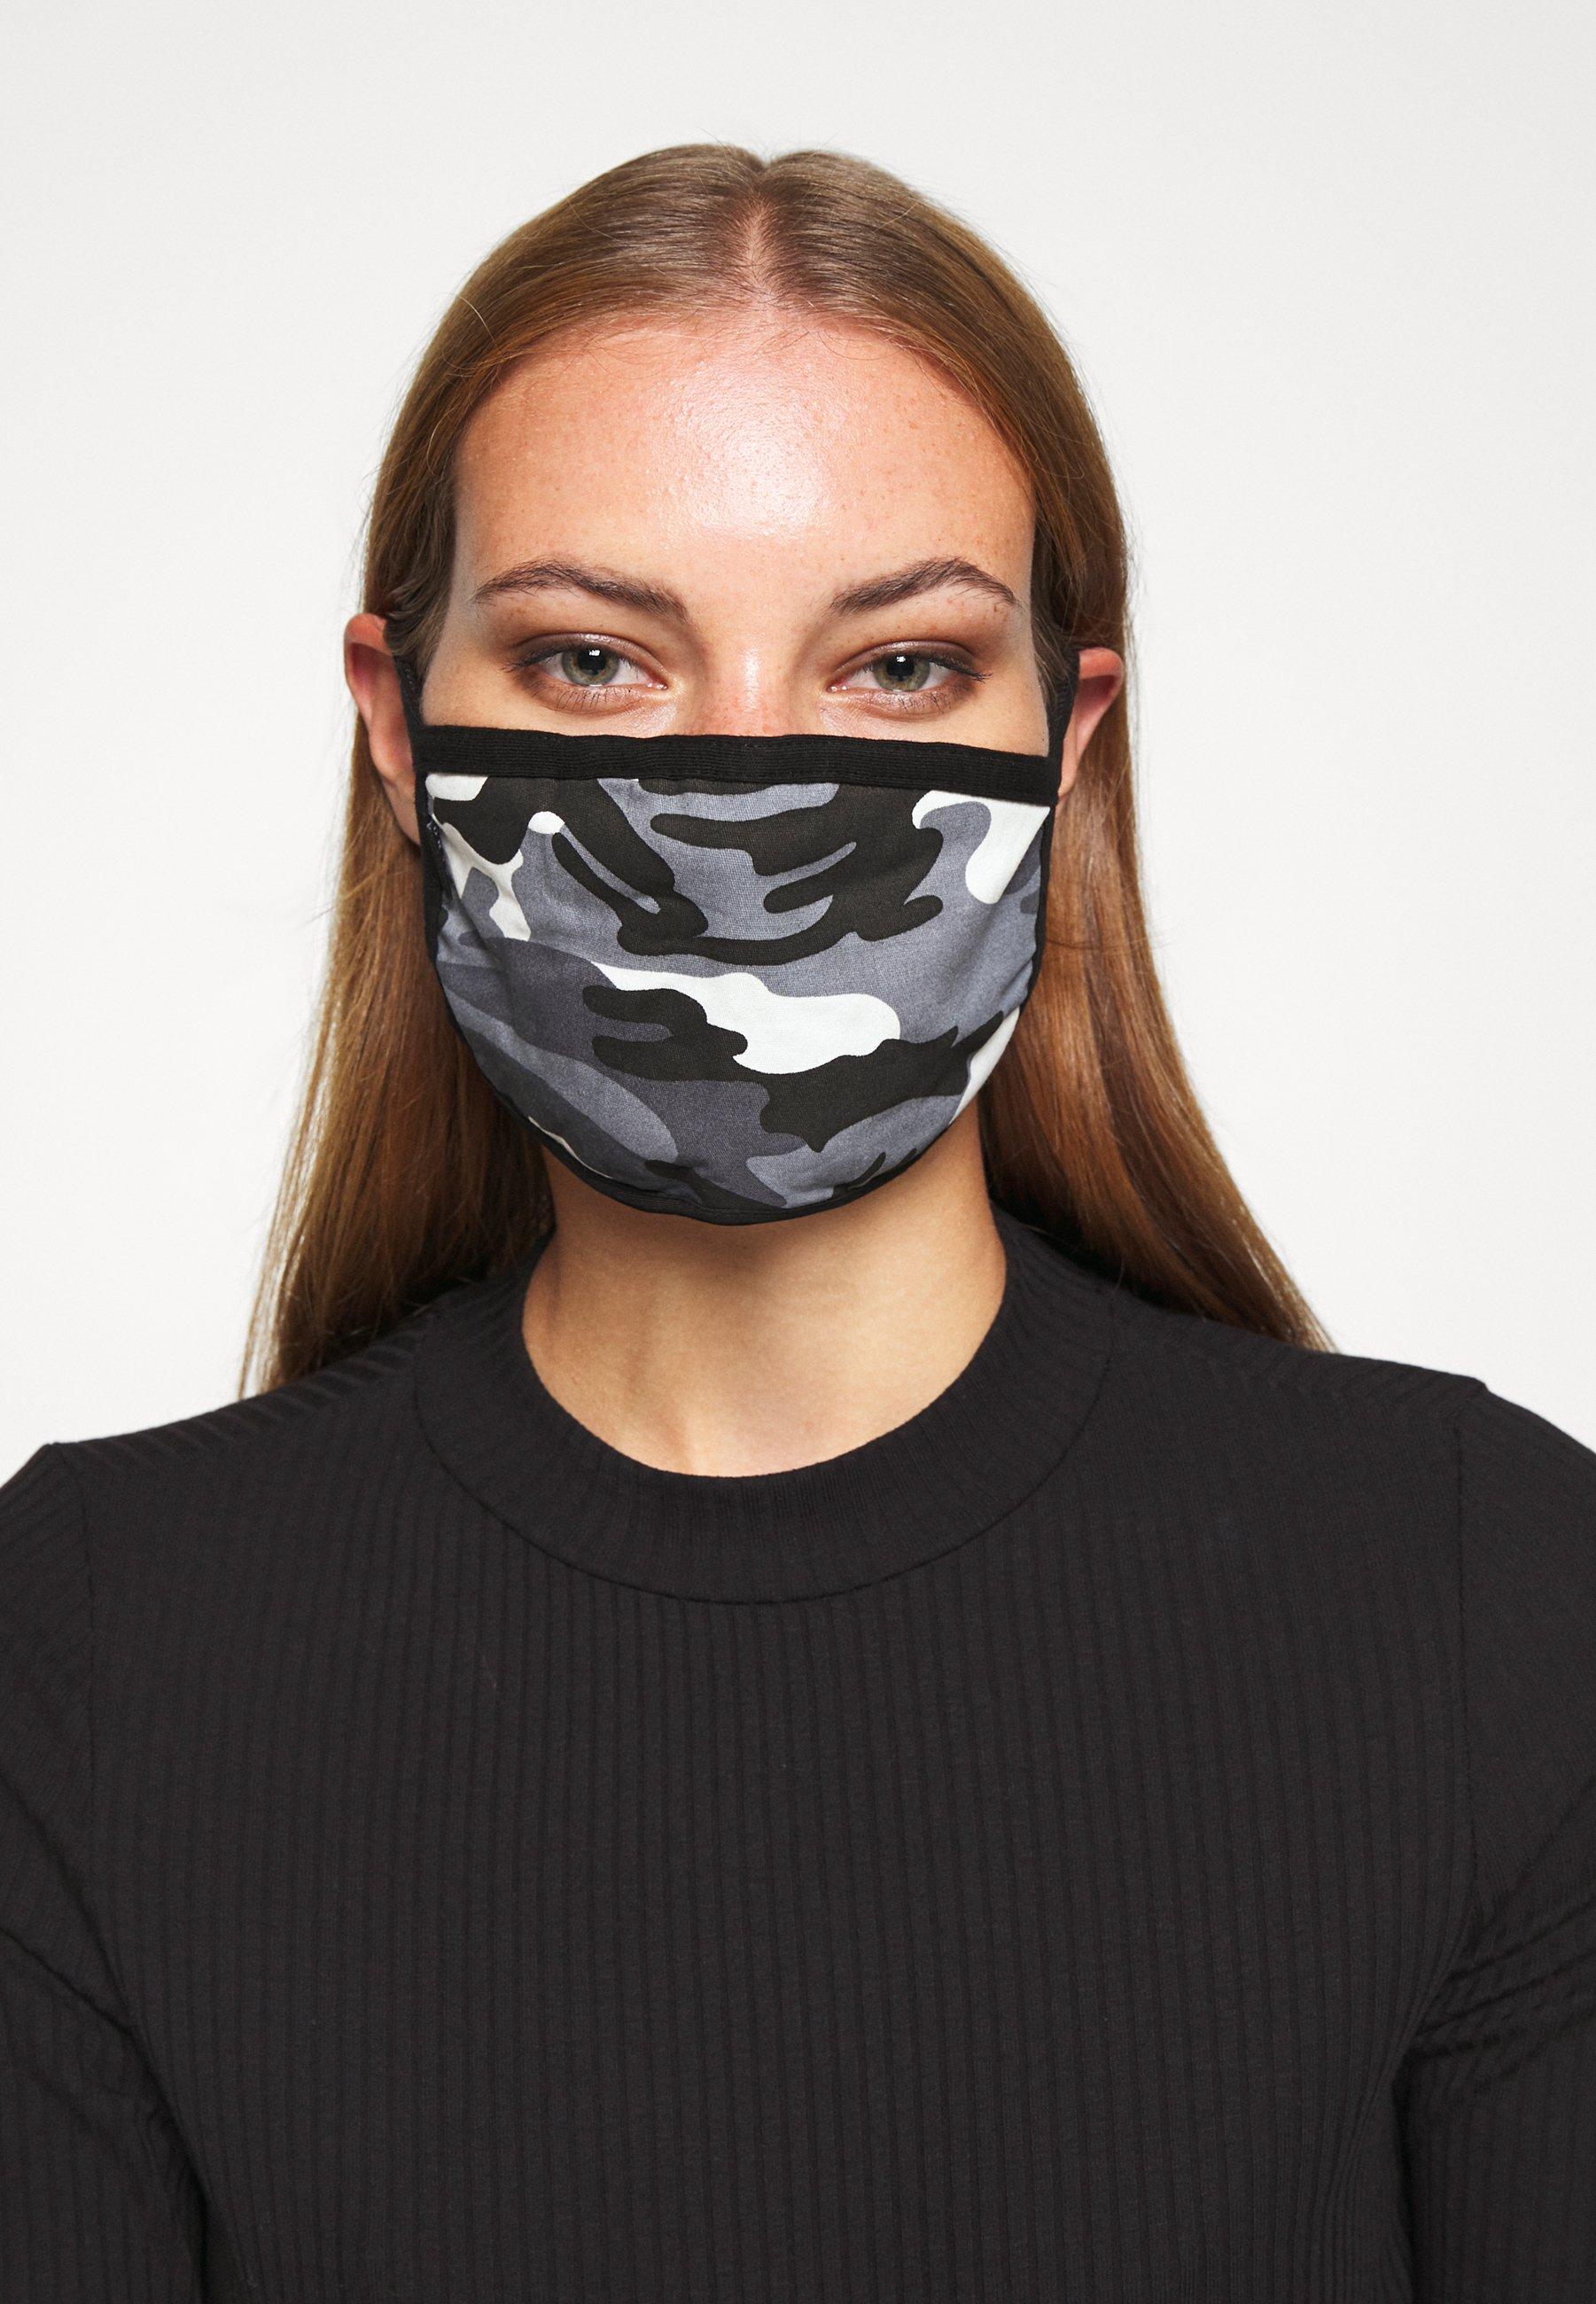 Men COMMUNITY MASK - Community mask